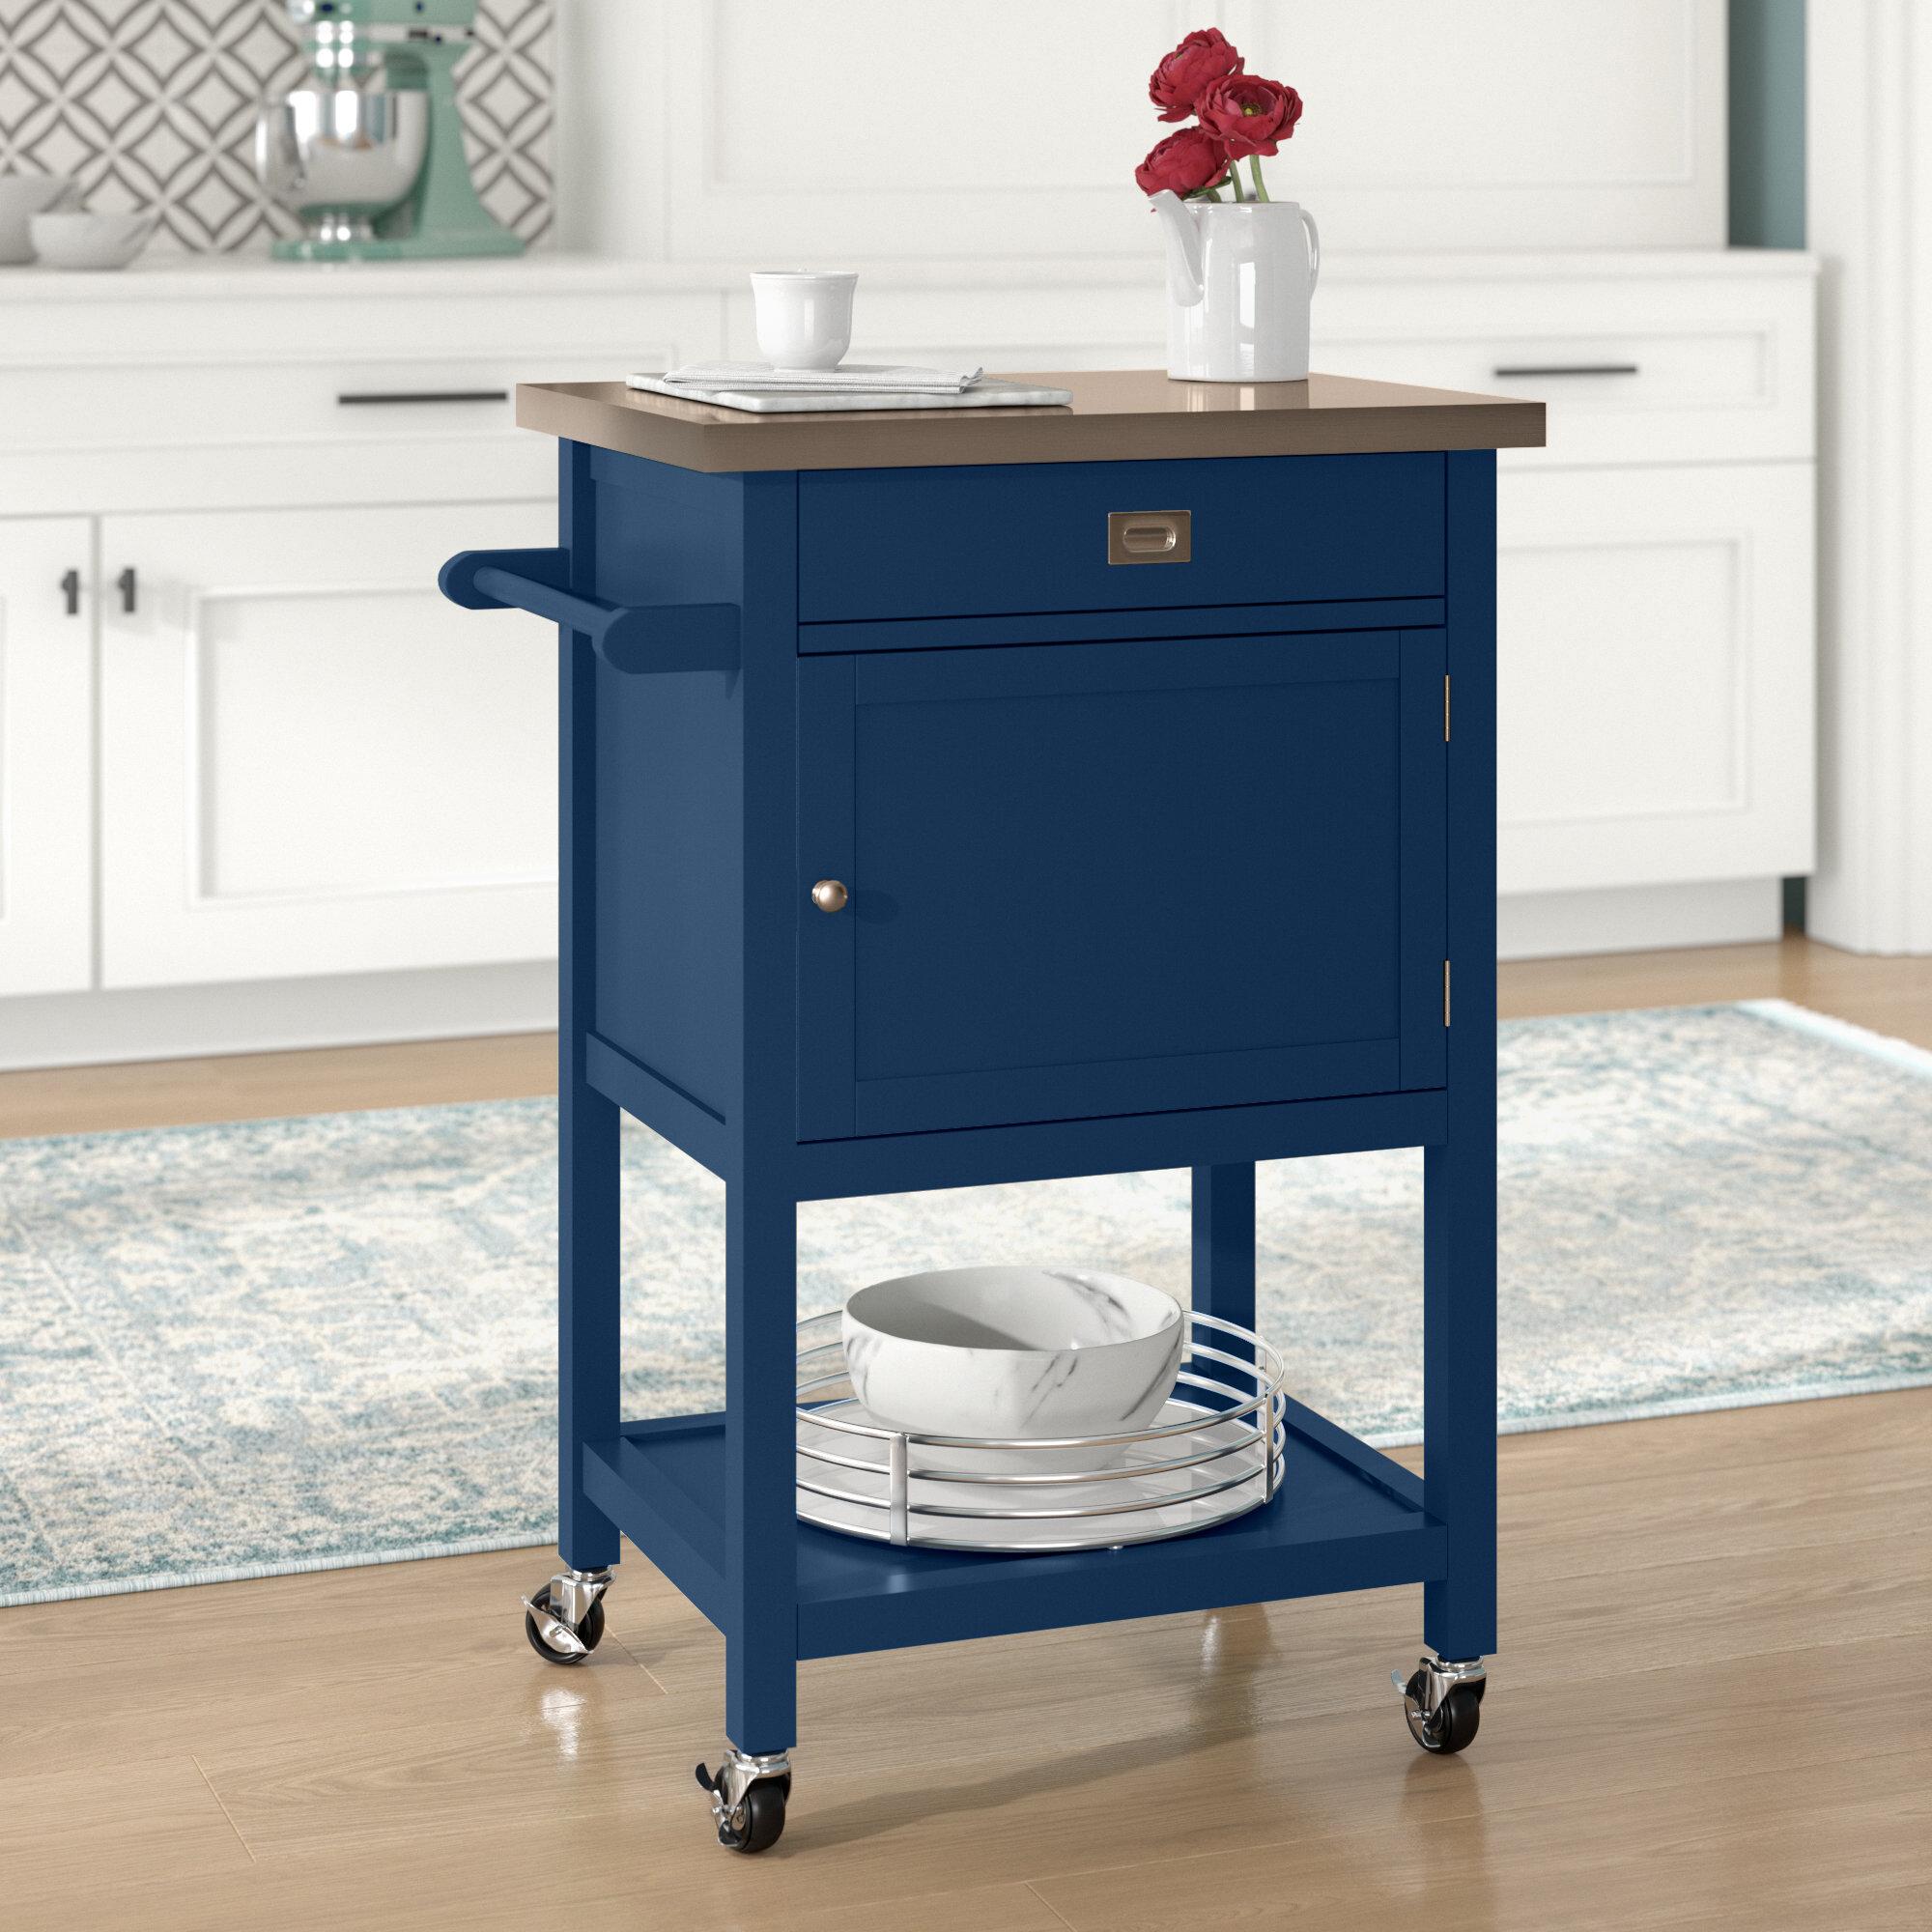 Blue Kitchen Islands Carts You Ll Love In 2021 Wayfair